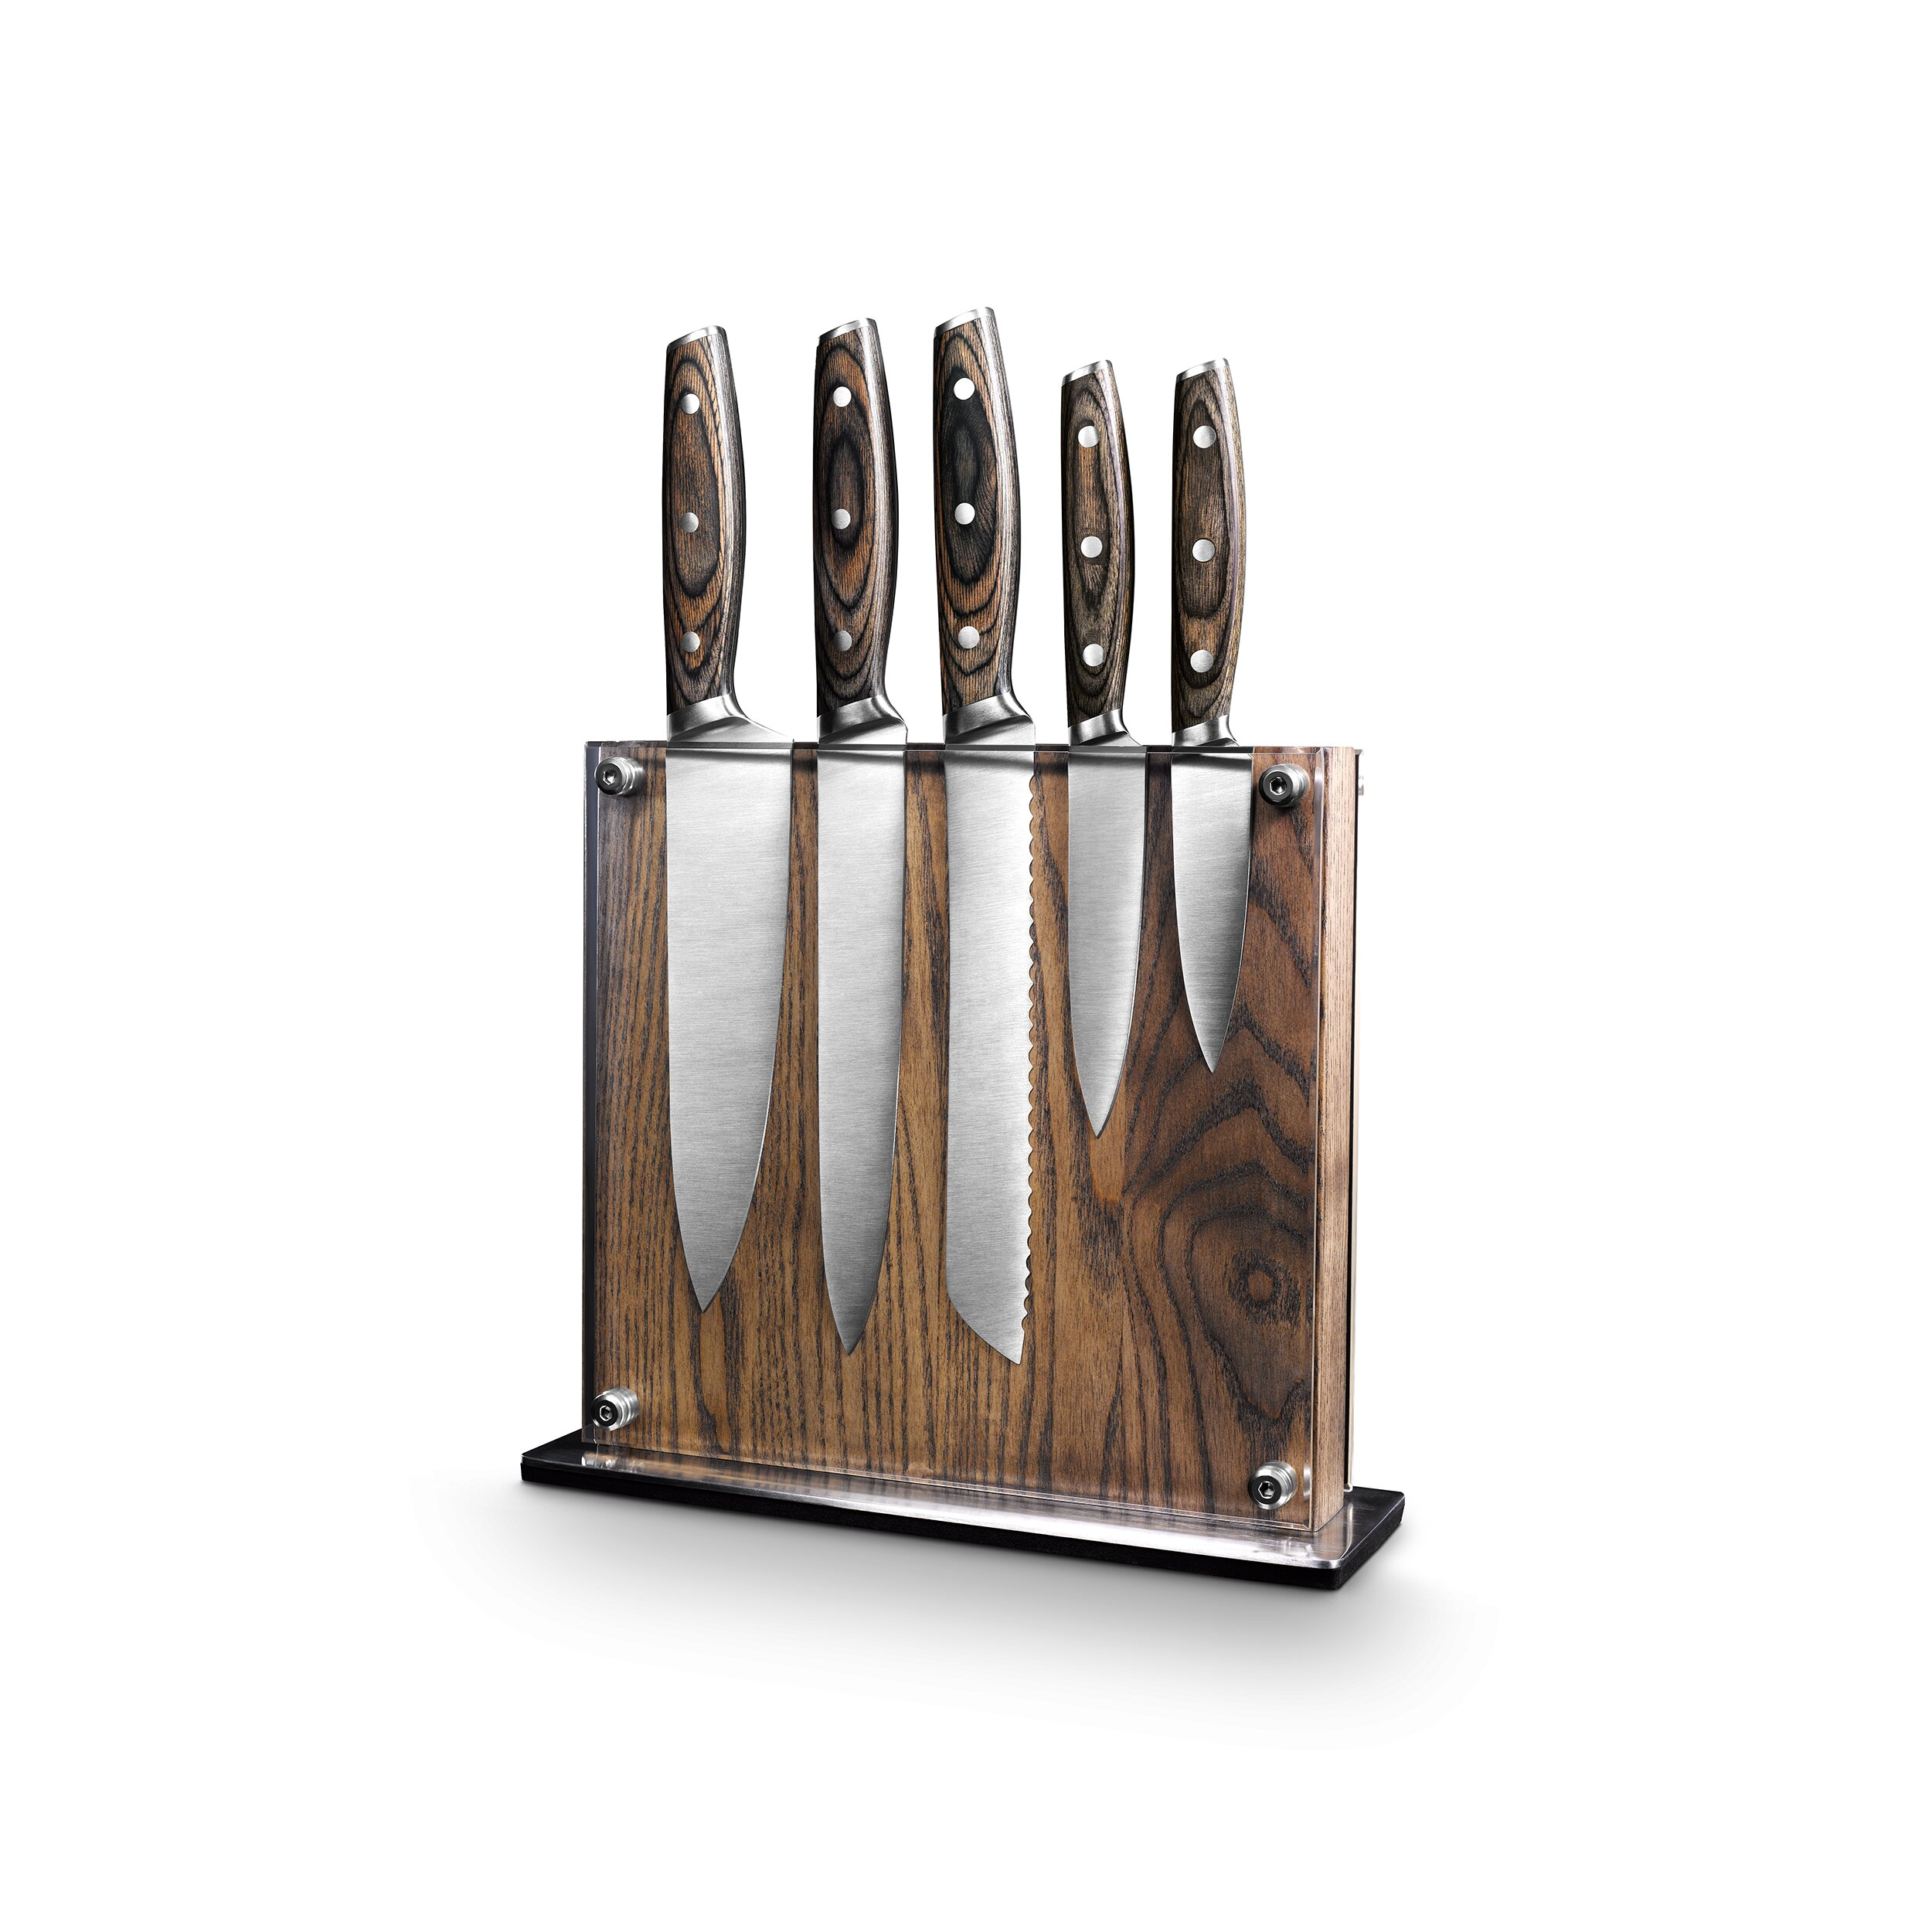 Art And Cook Ash Wood Magnetic 6 Piece Knife Block Set Reviews Wayfair